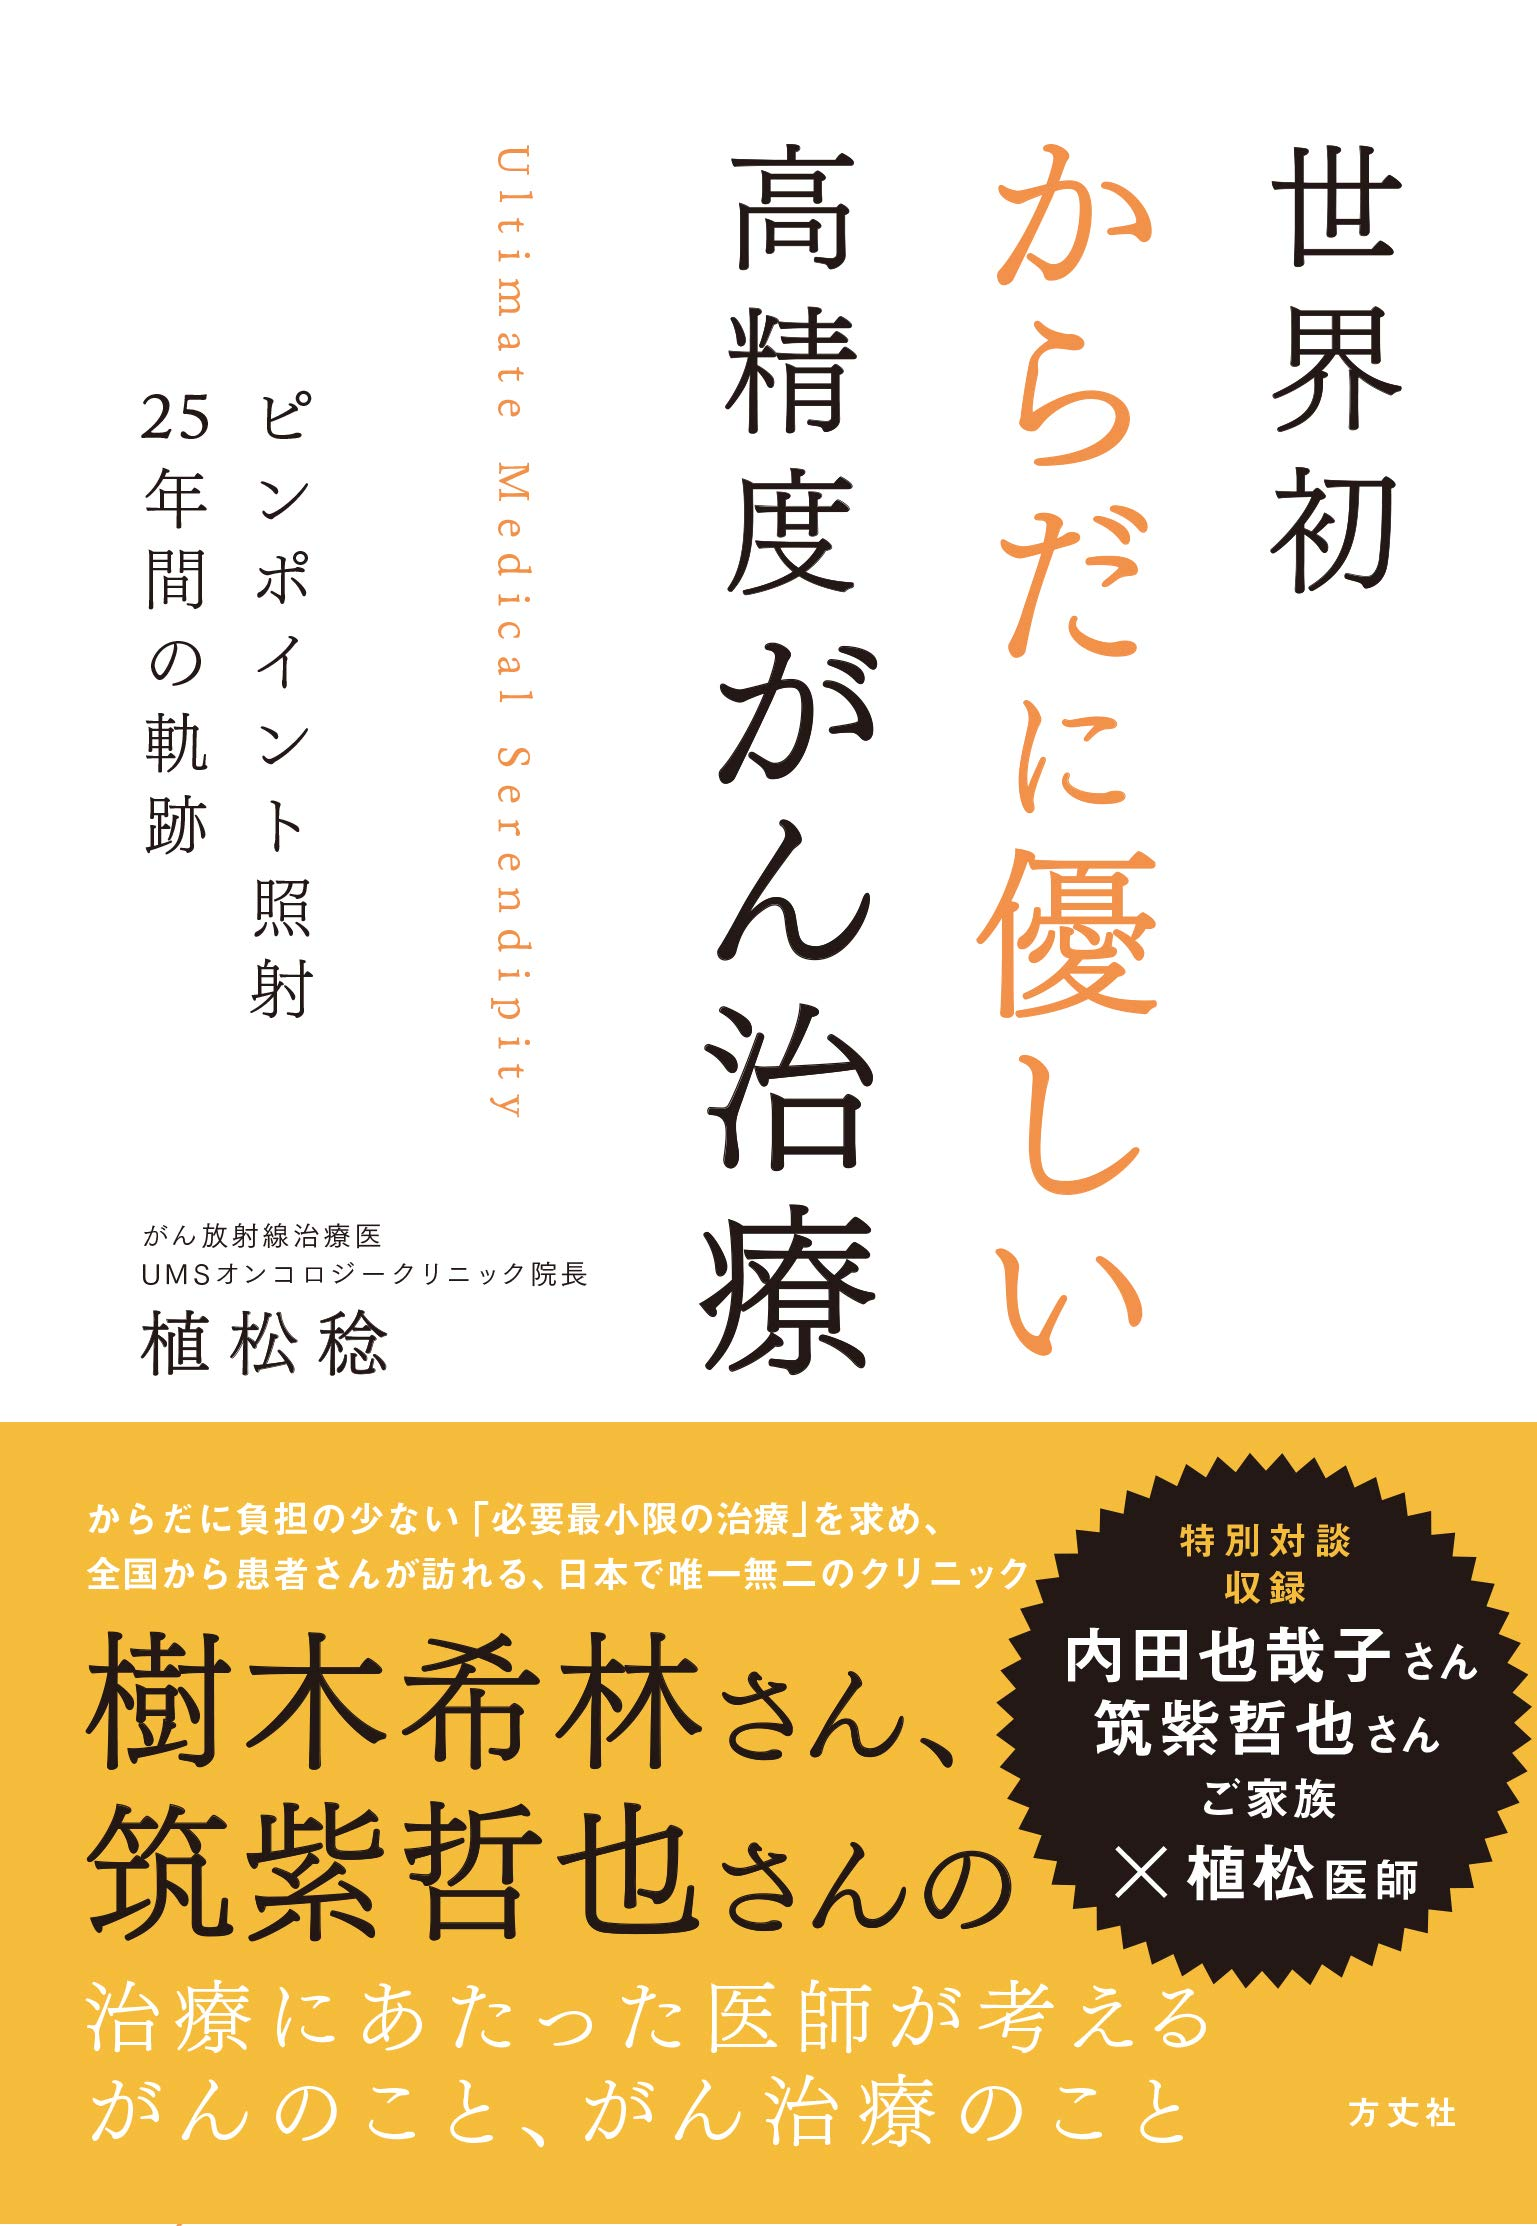 115-H1-karadaniyasashiigan.jpg